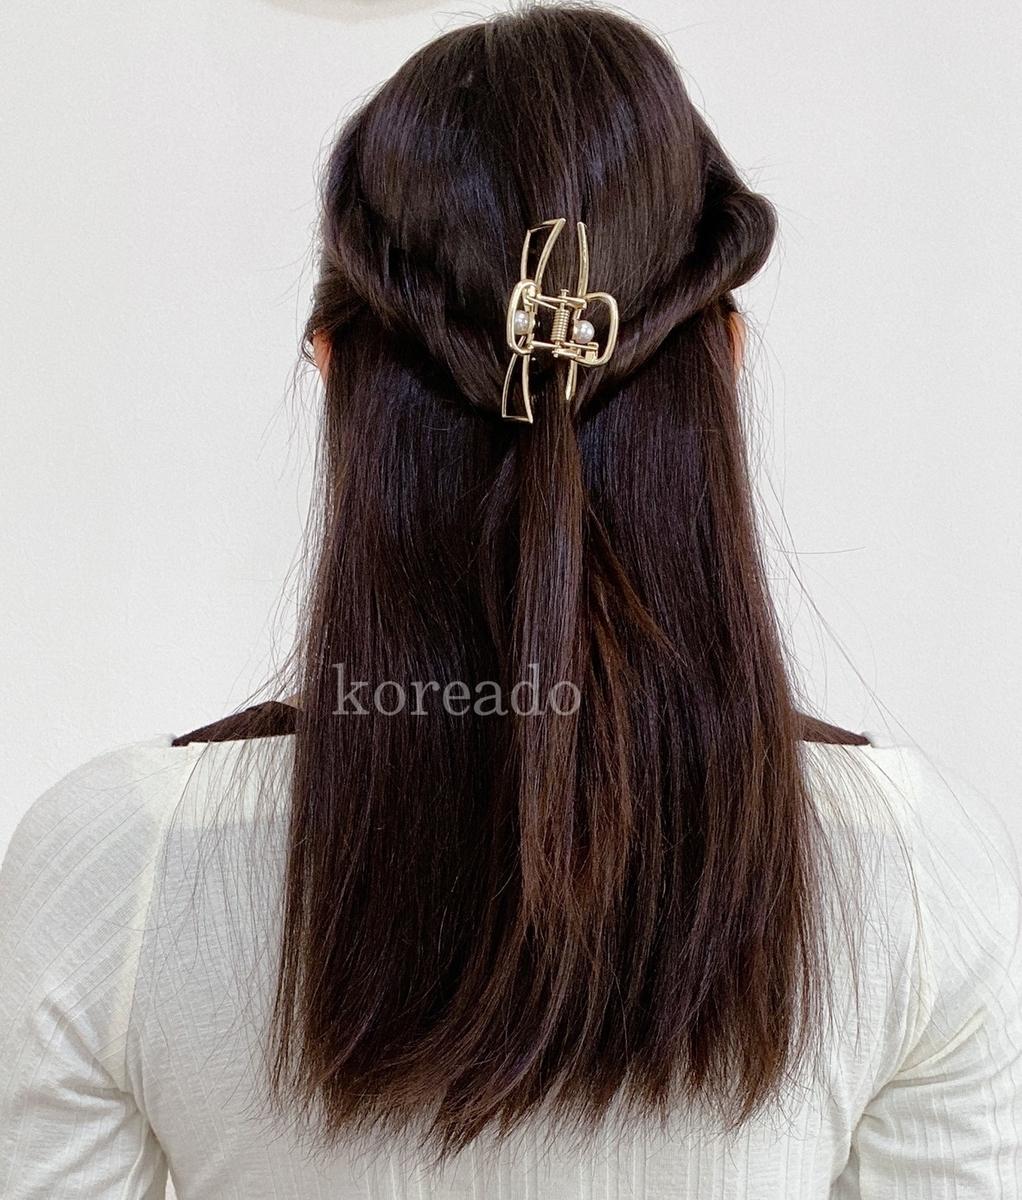 f:id:i-love-korea:20210424172925j:plain